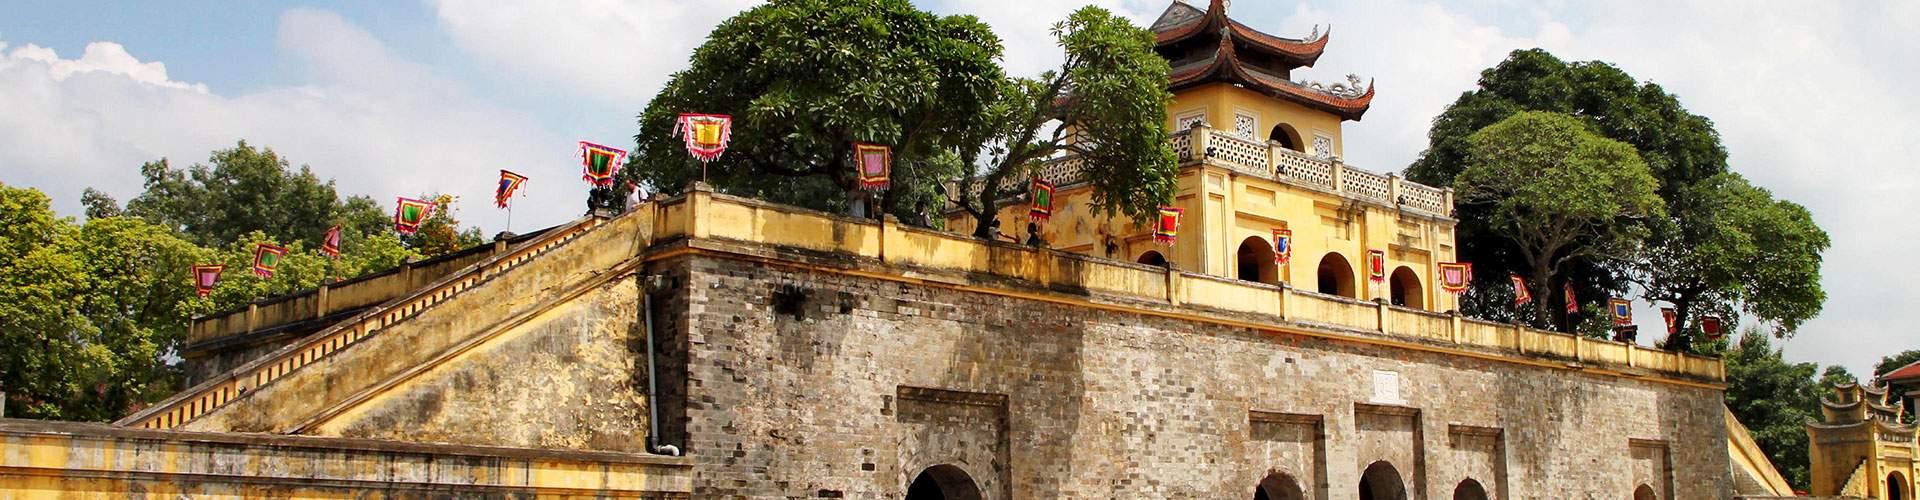 Ciudadela Imperial Thang Long